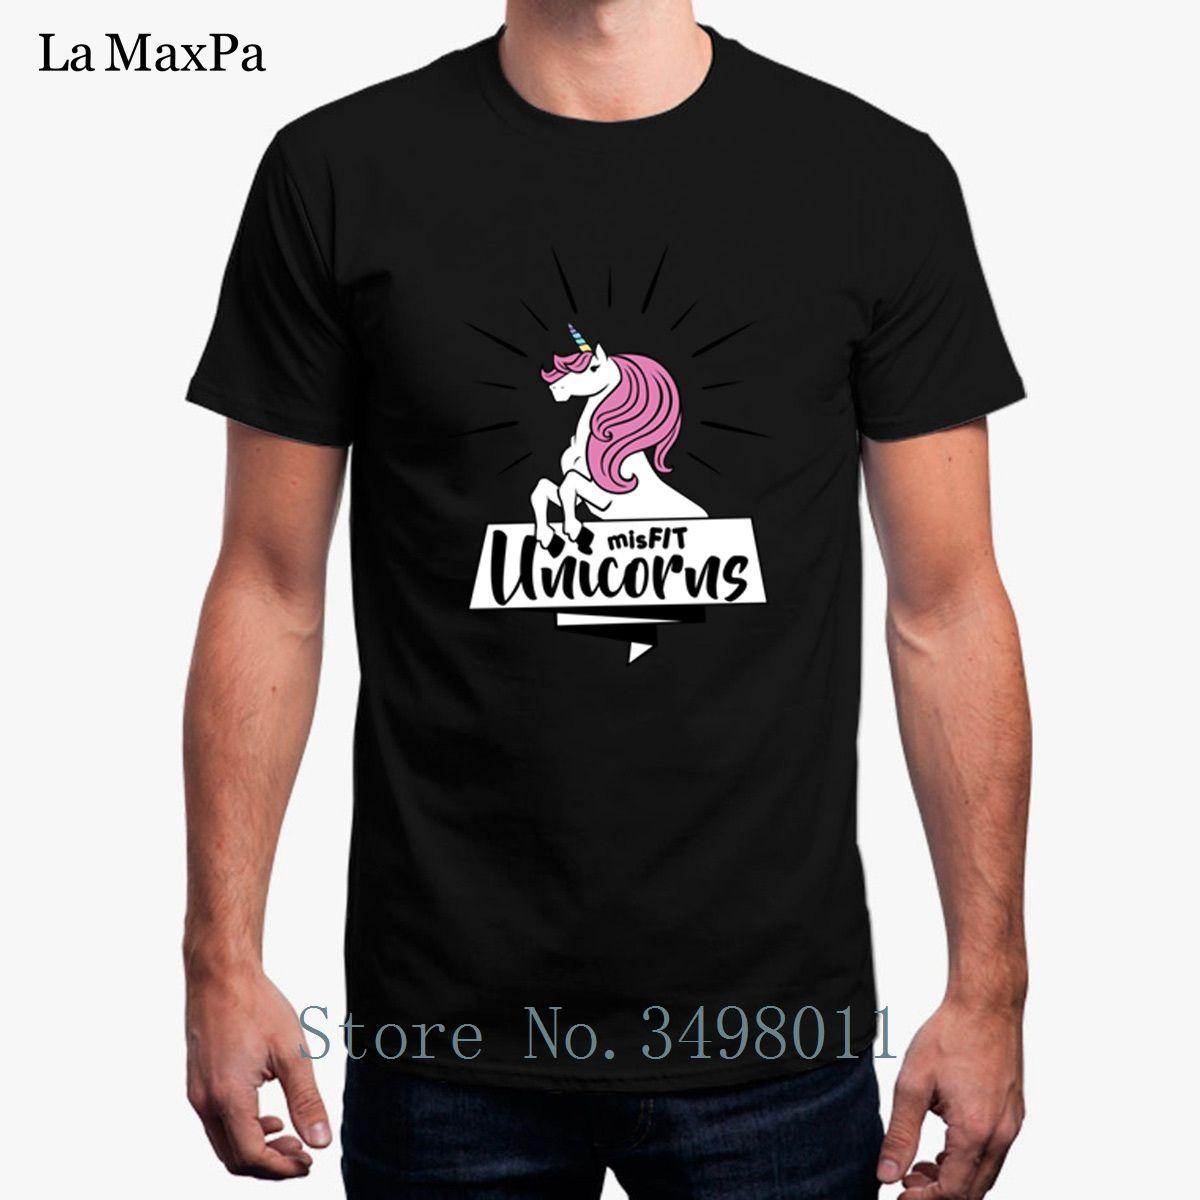 New Misfit Unicorns Full Color T Shirt For Men Solid Color T Shirt